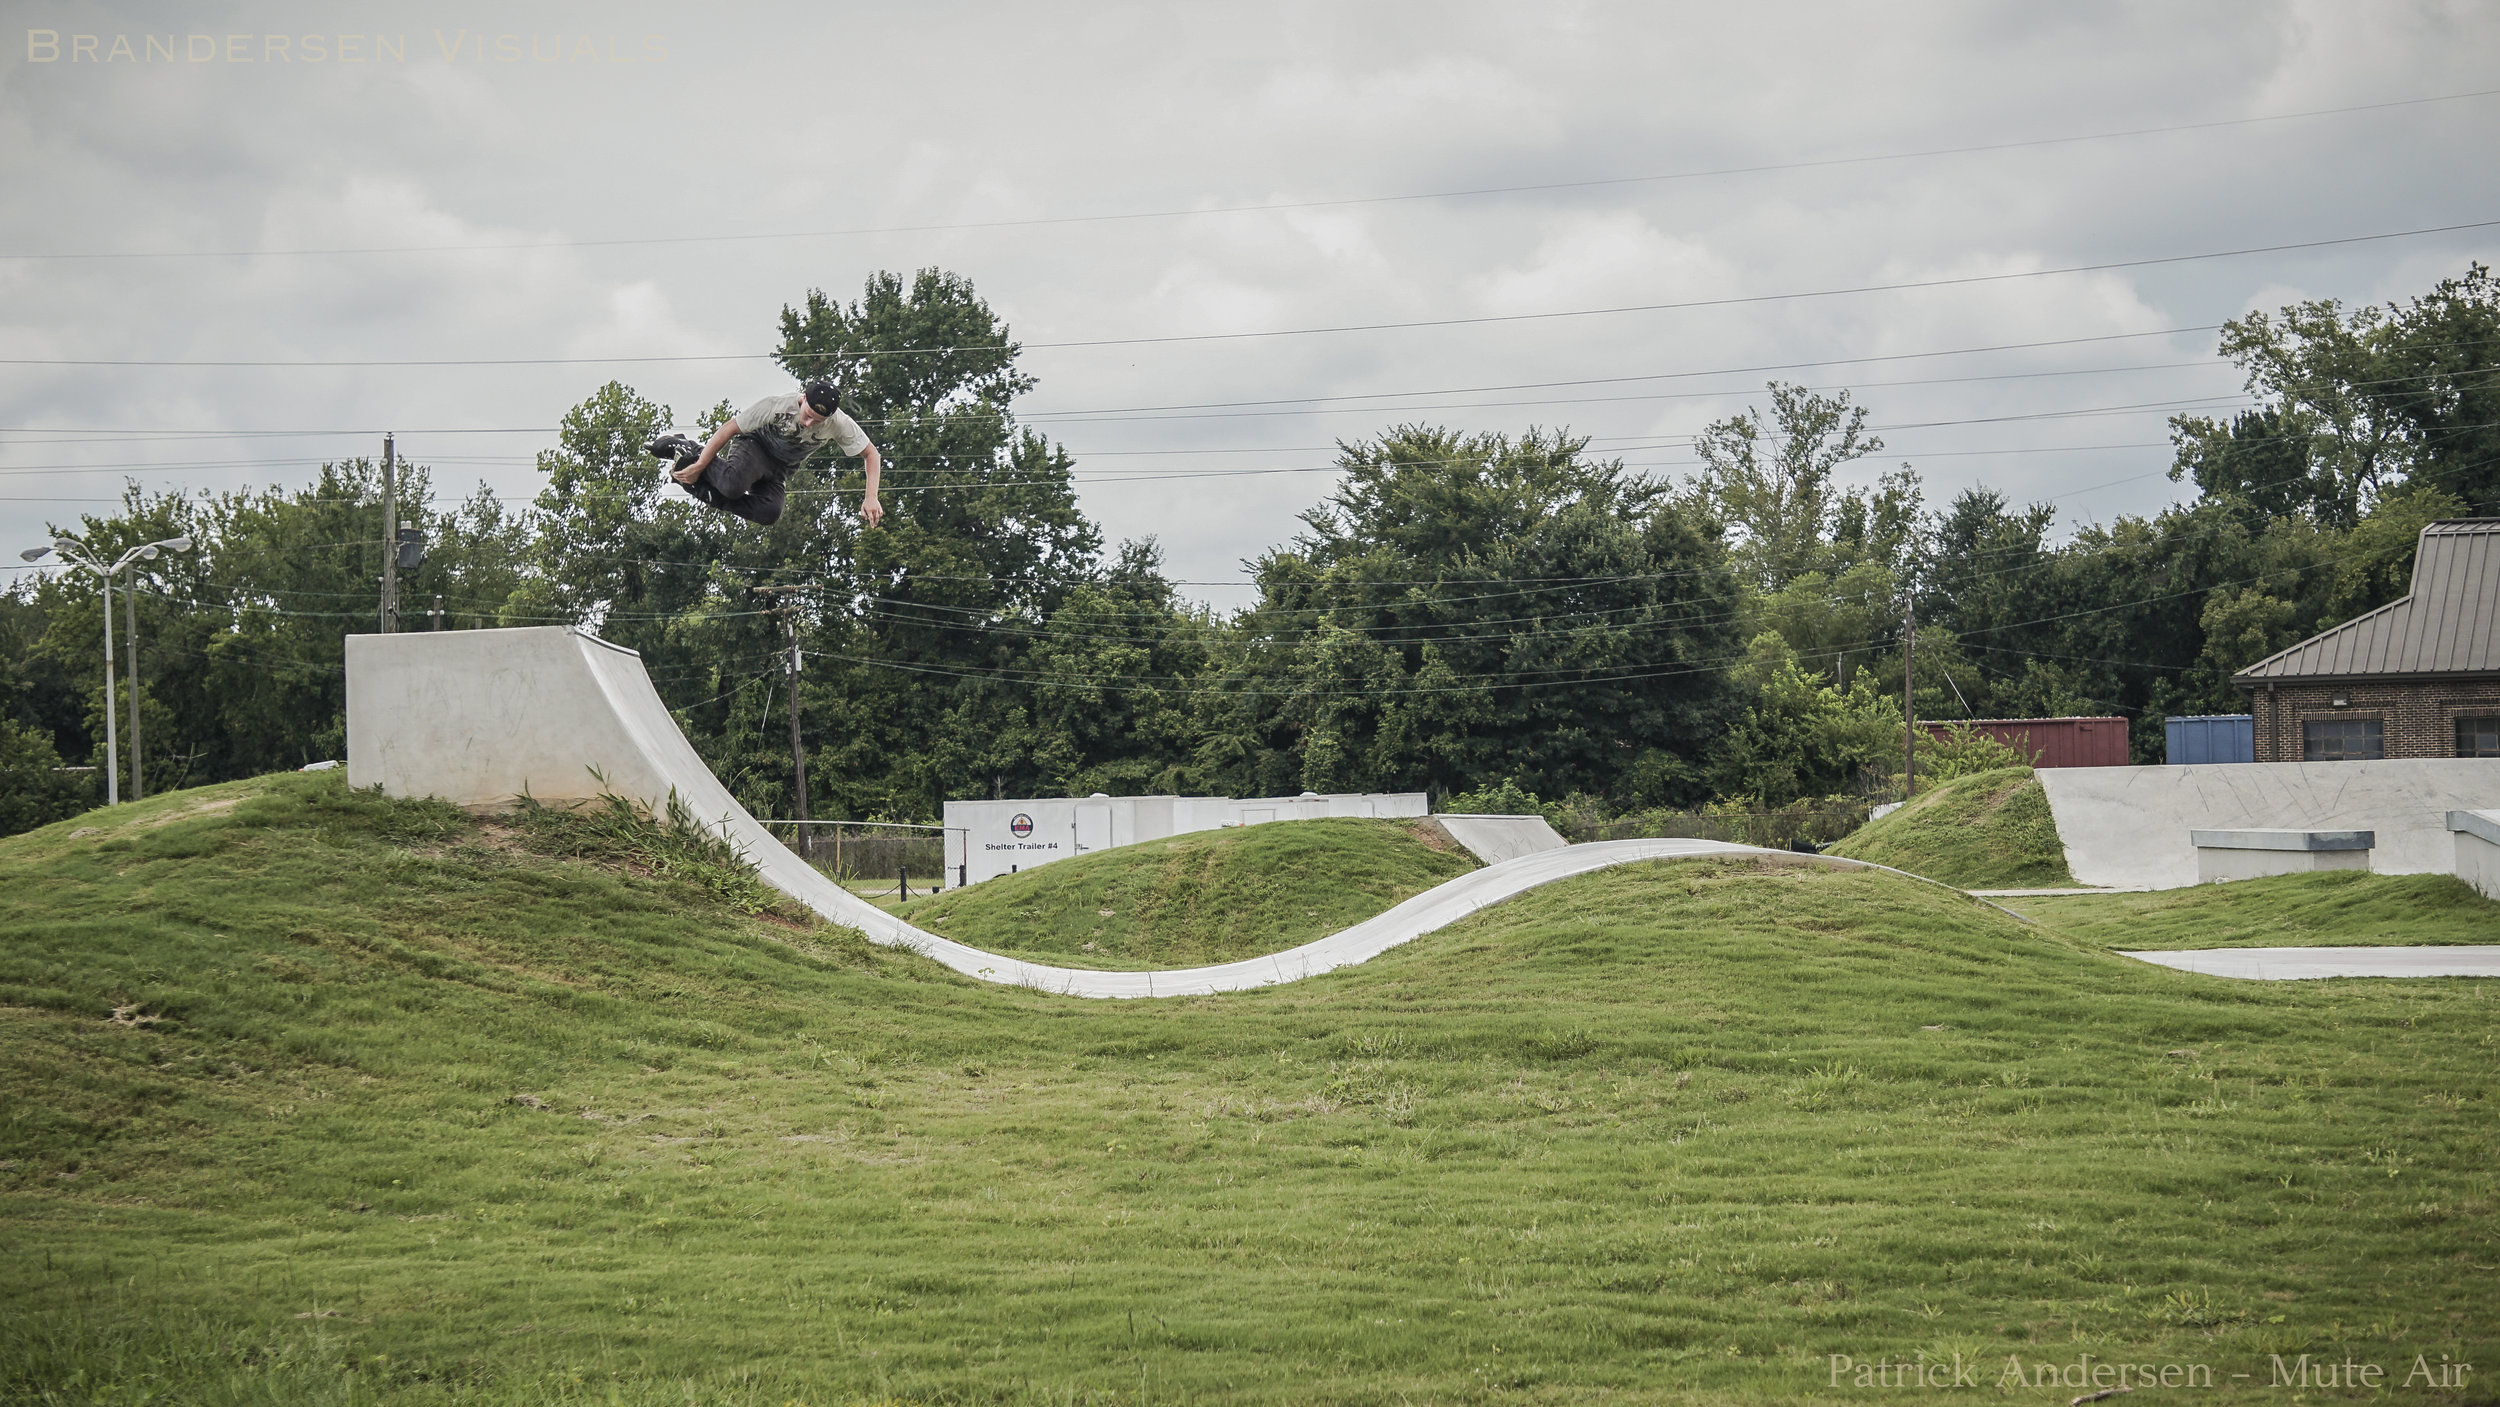 Patrick Andersen - Mute - Photo by Brandon Andersen